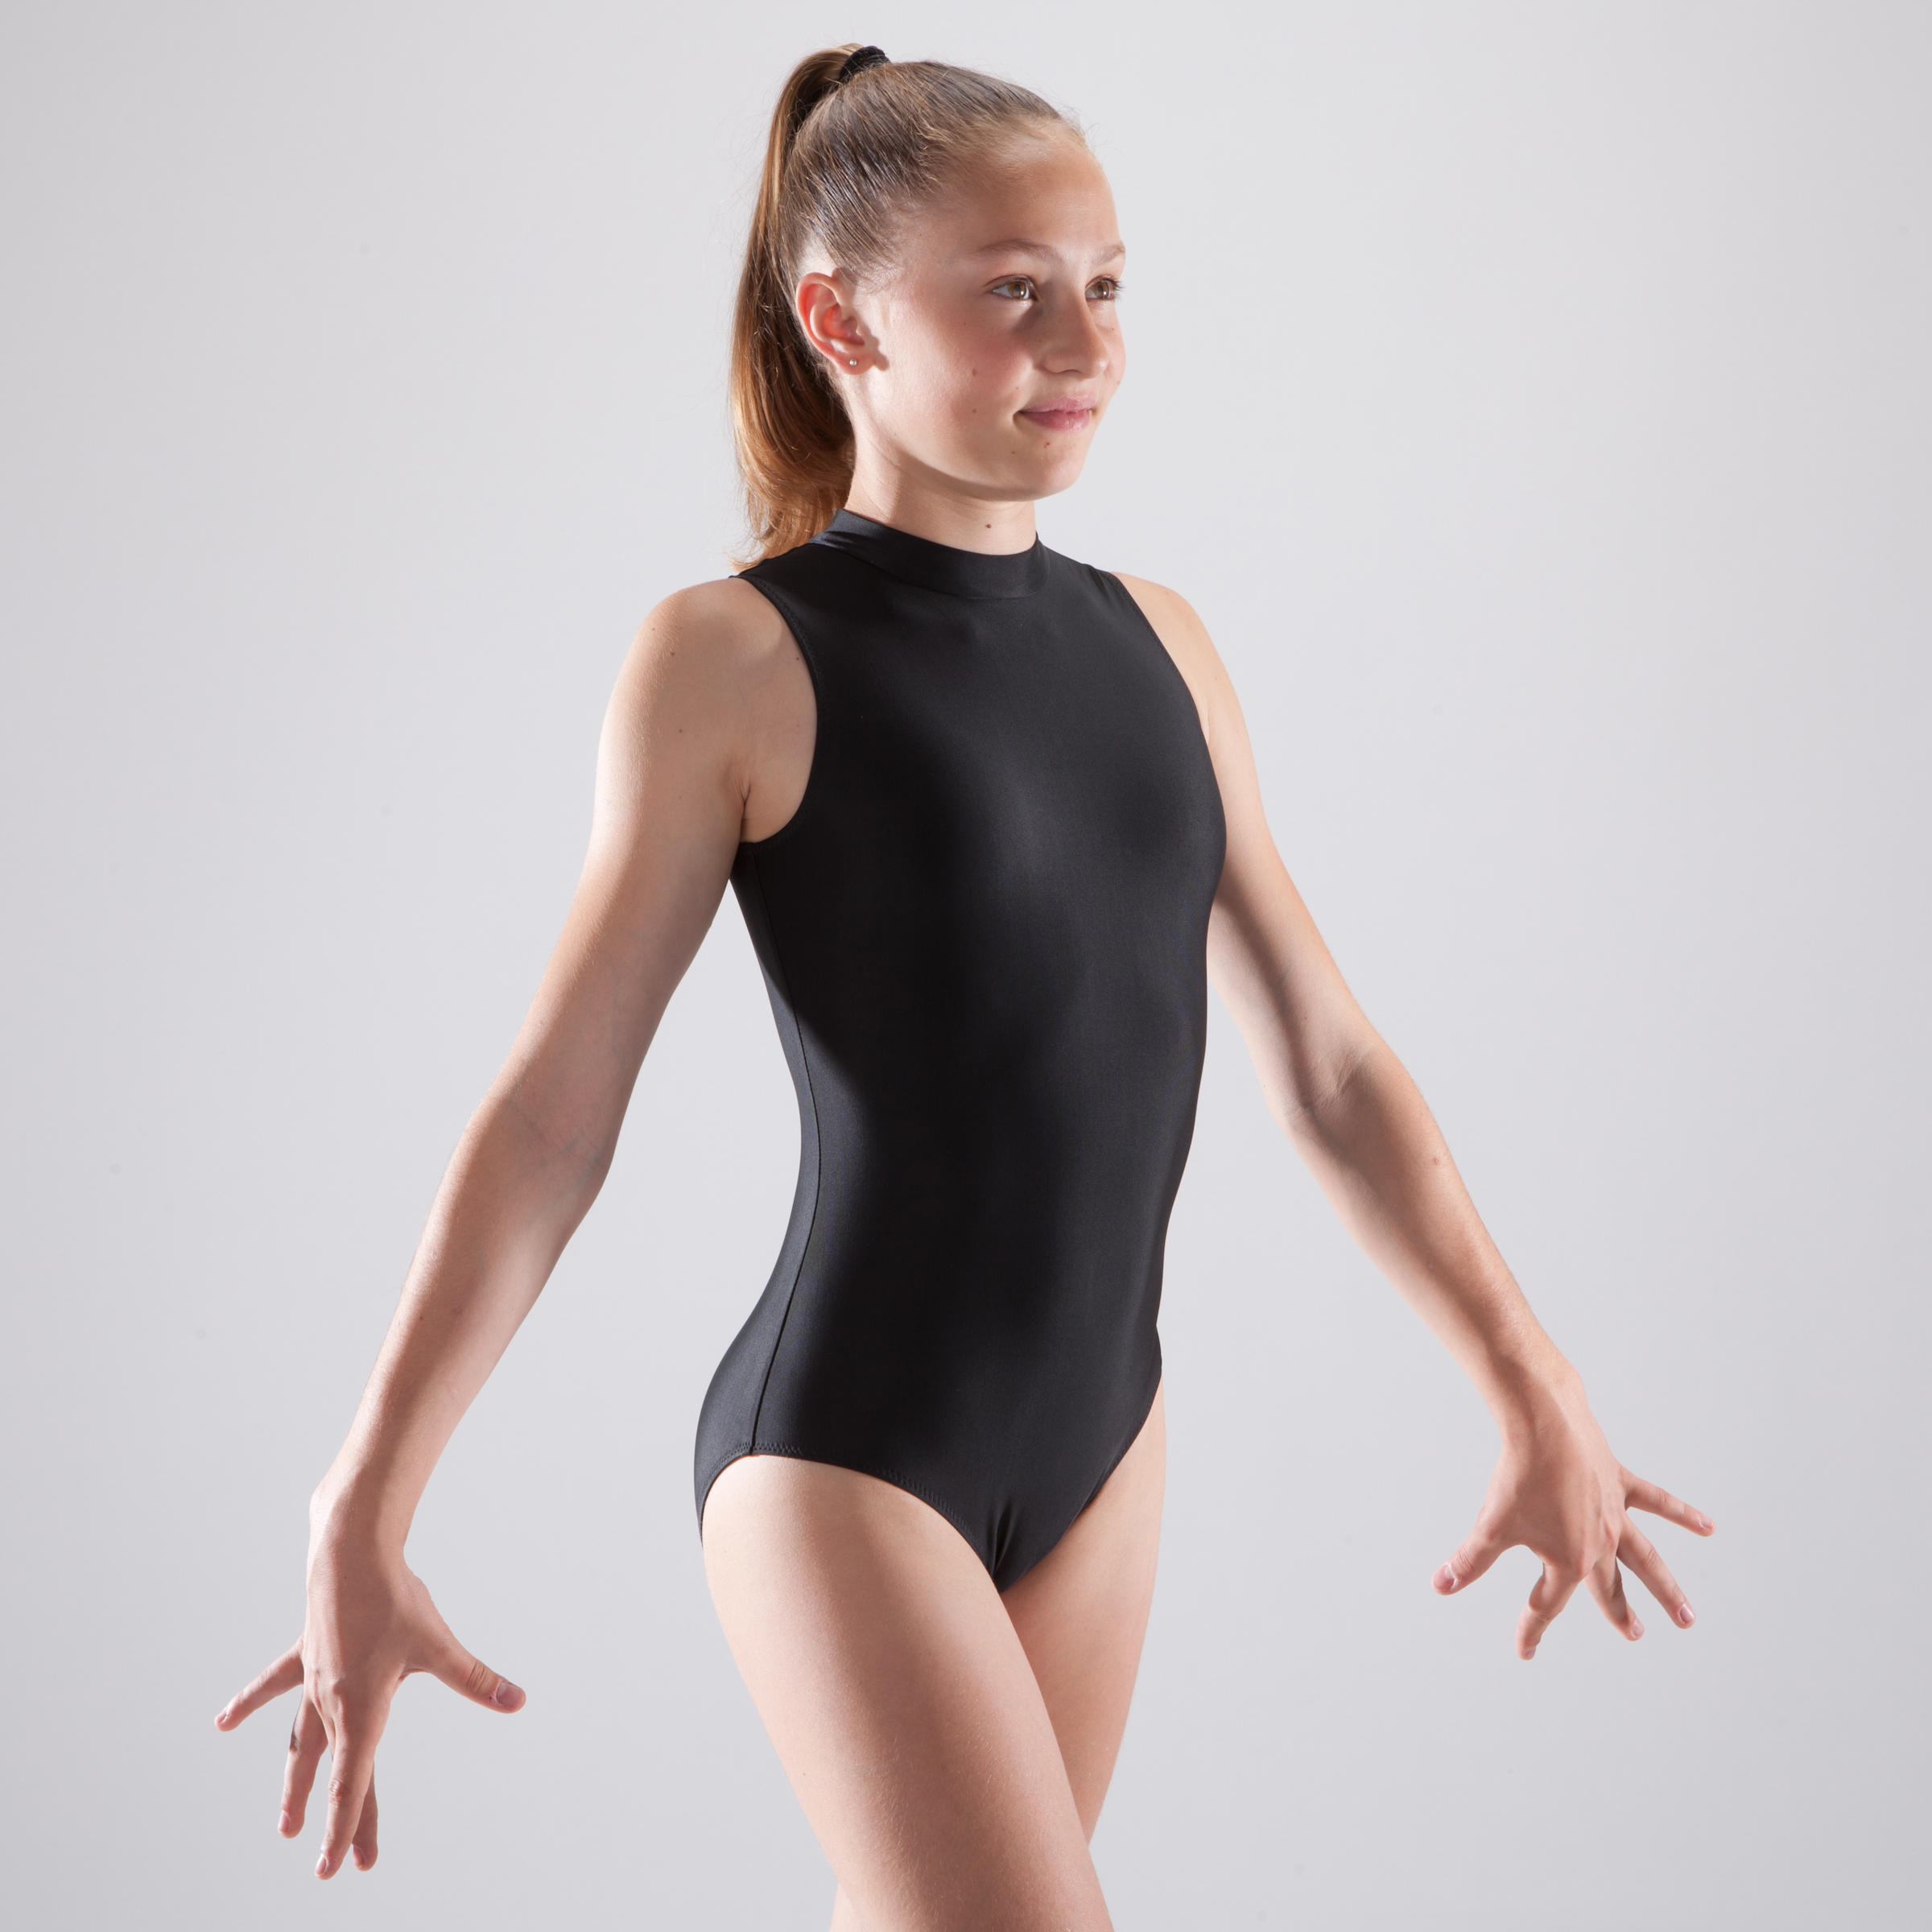 Girls' Sleeveless Gymnastics Leotard